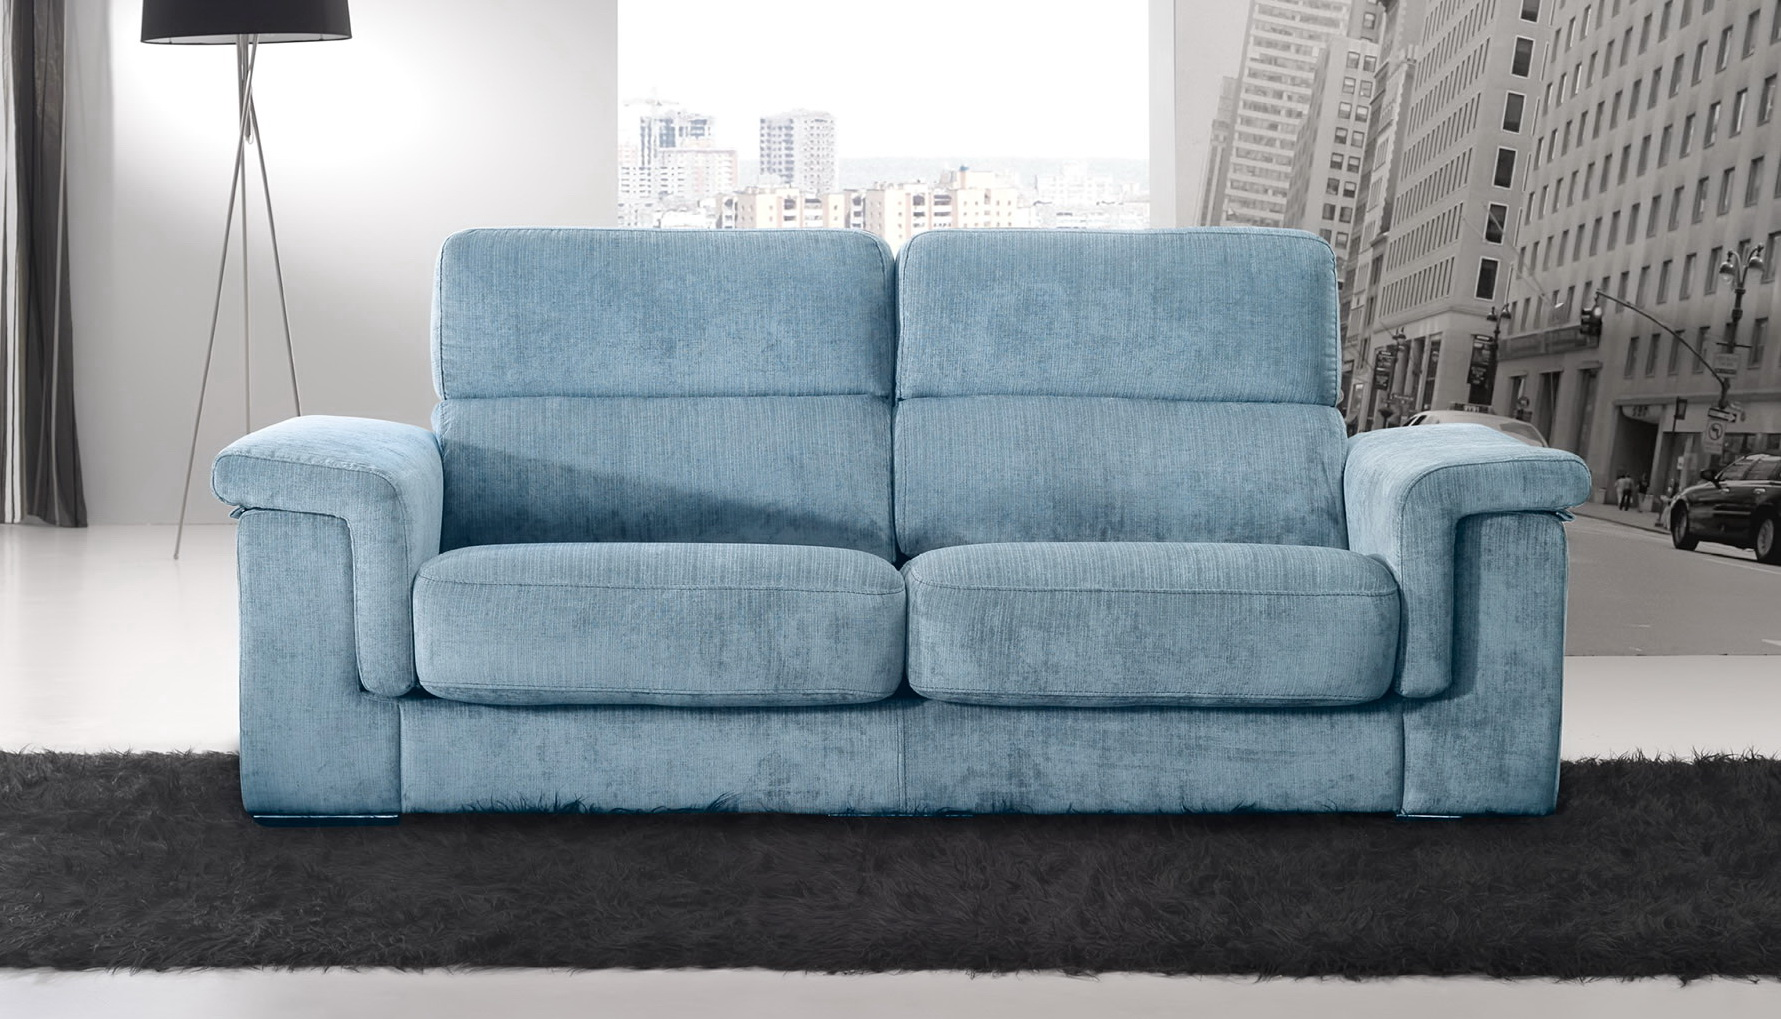 Zara sof chaise longue modular asientos extensibles by for Bautista muebles y decoracion